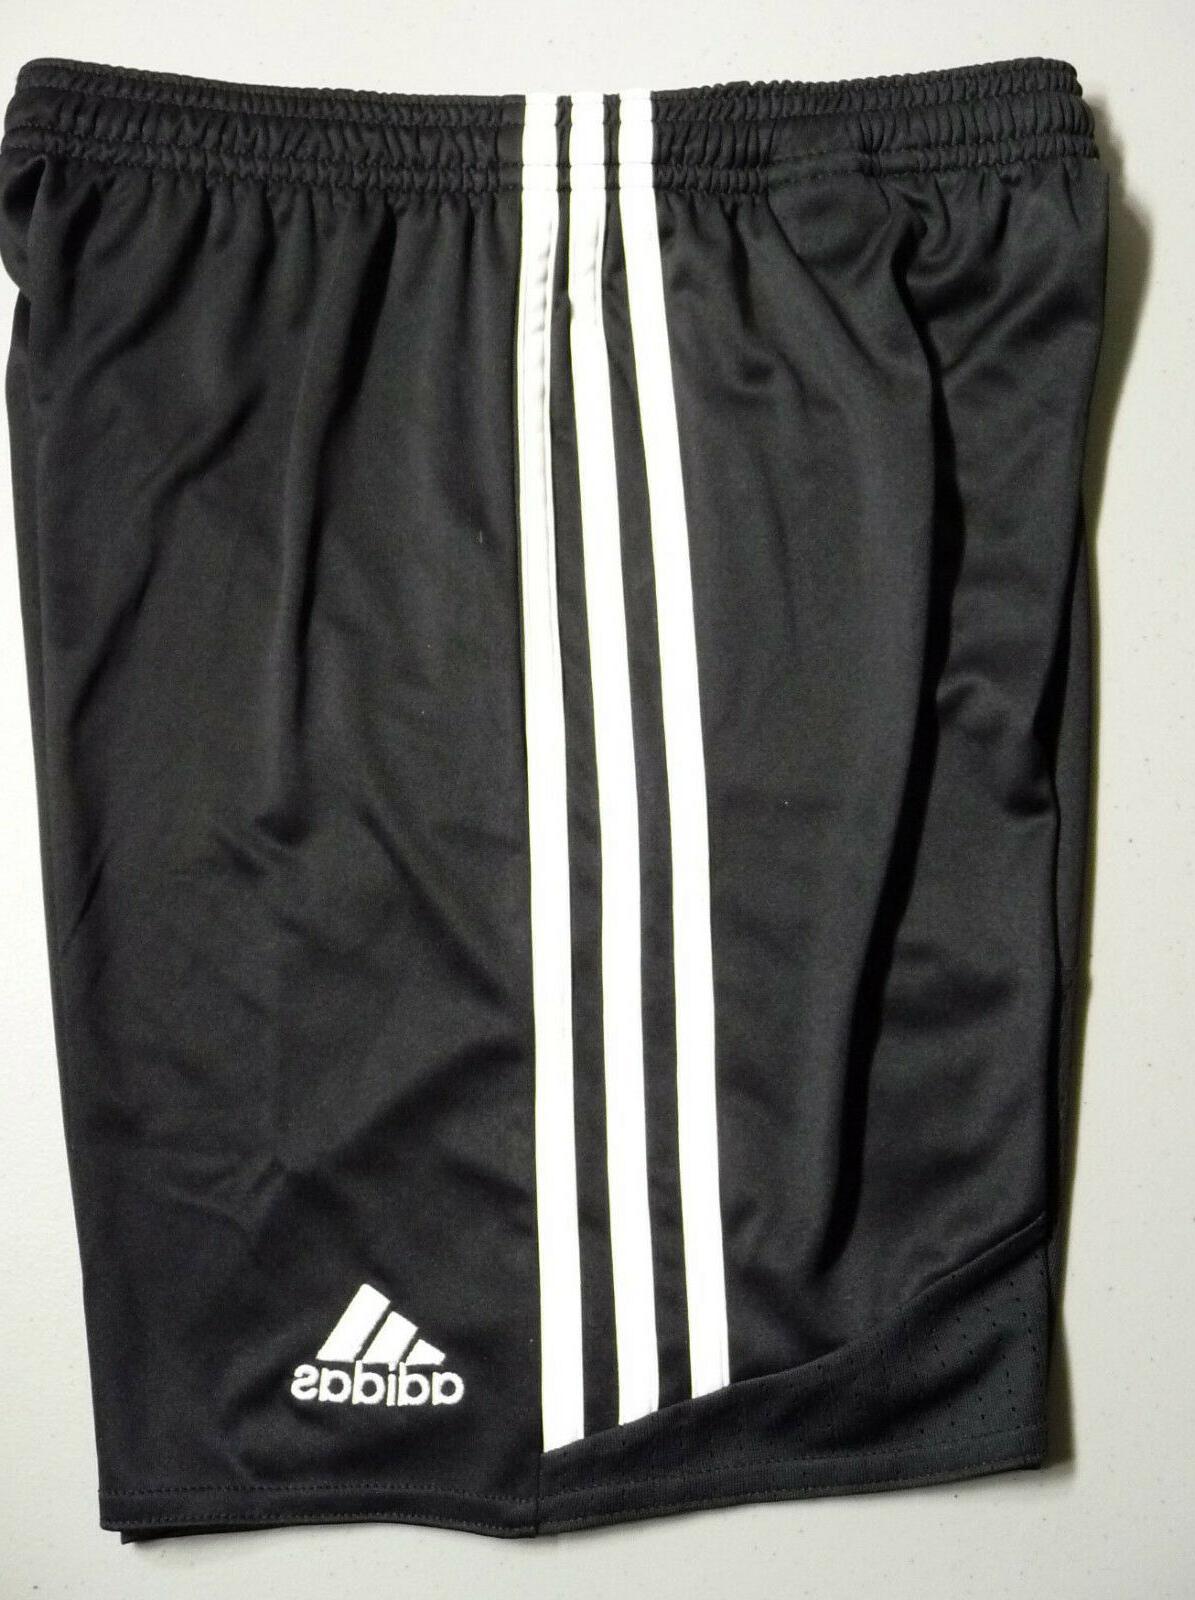 adidas Youth Shorts Colors NWT Uniform